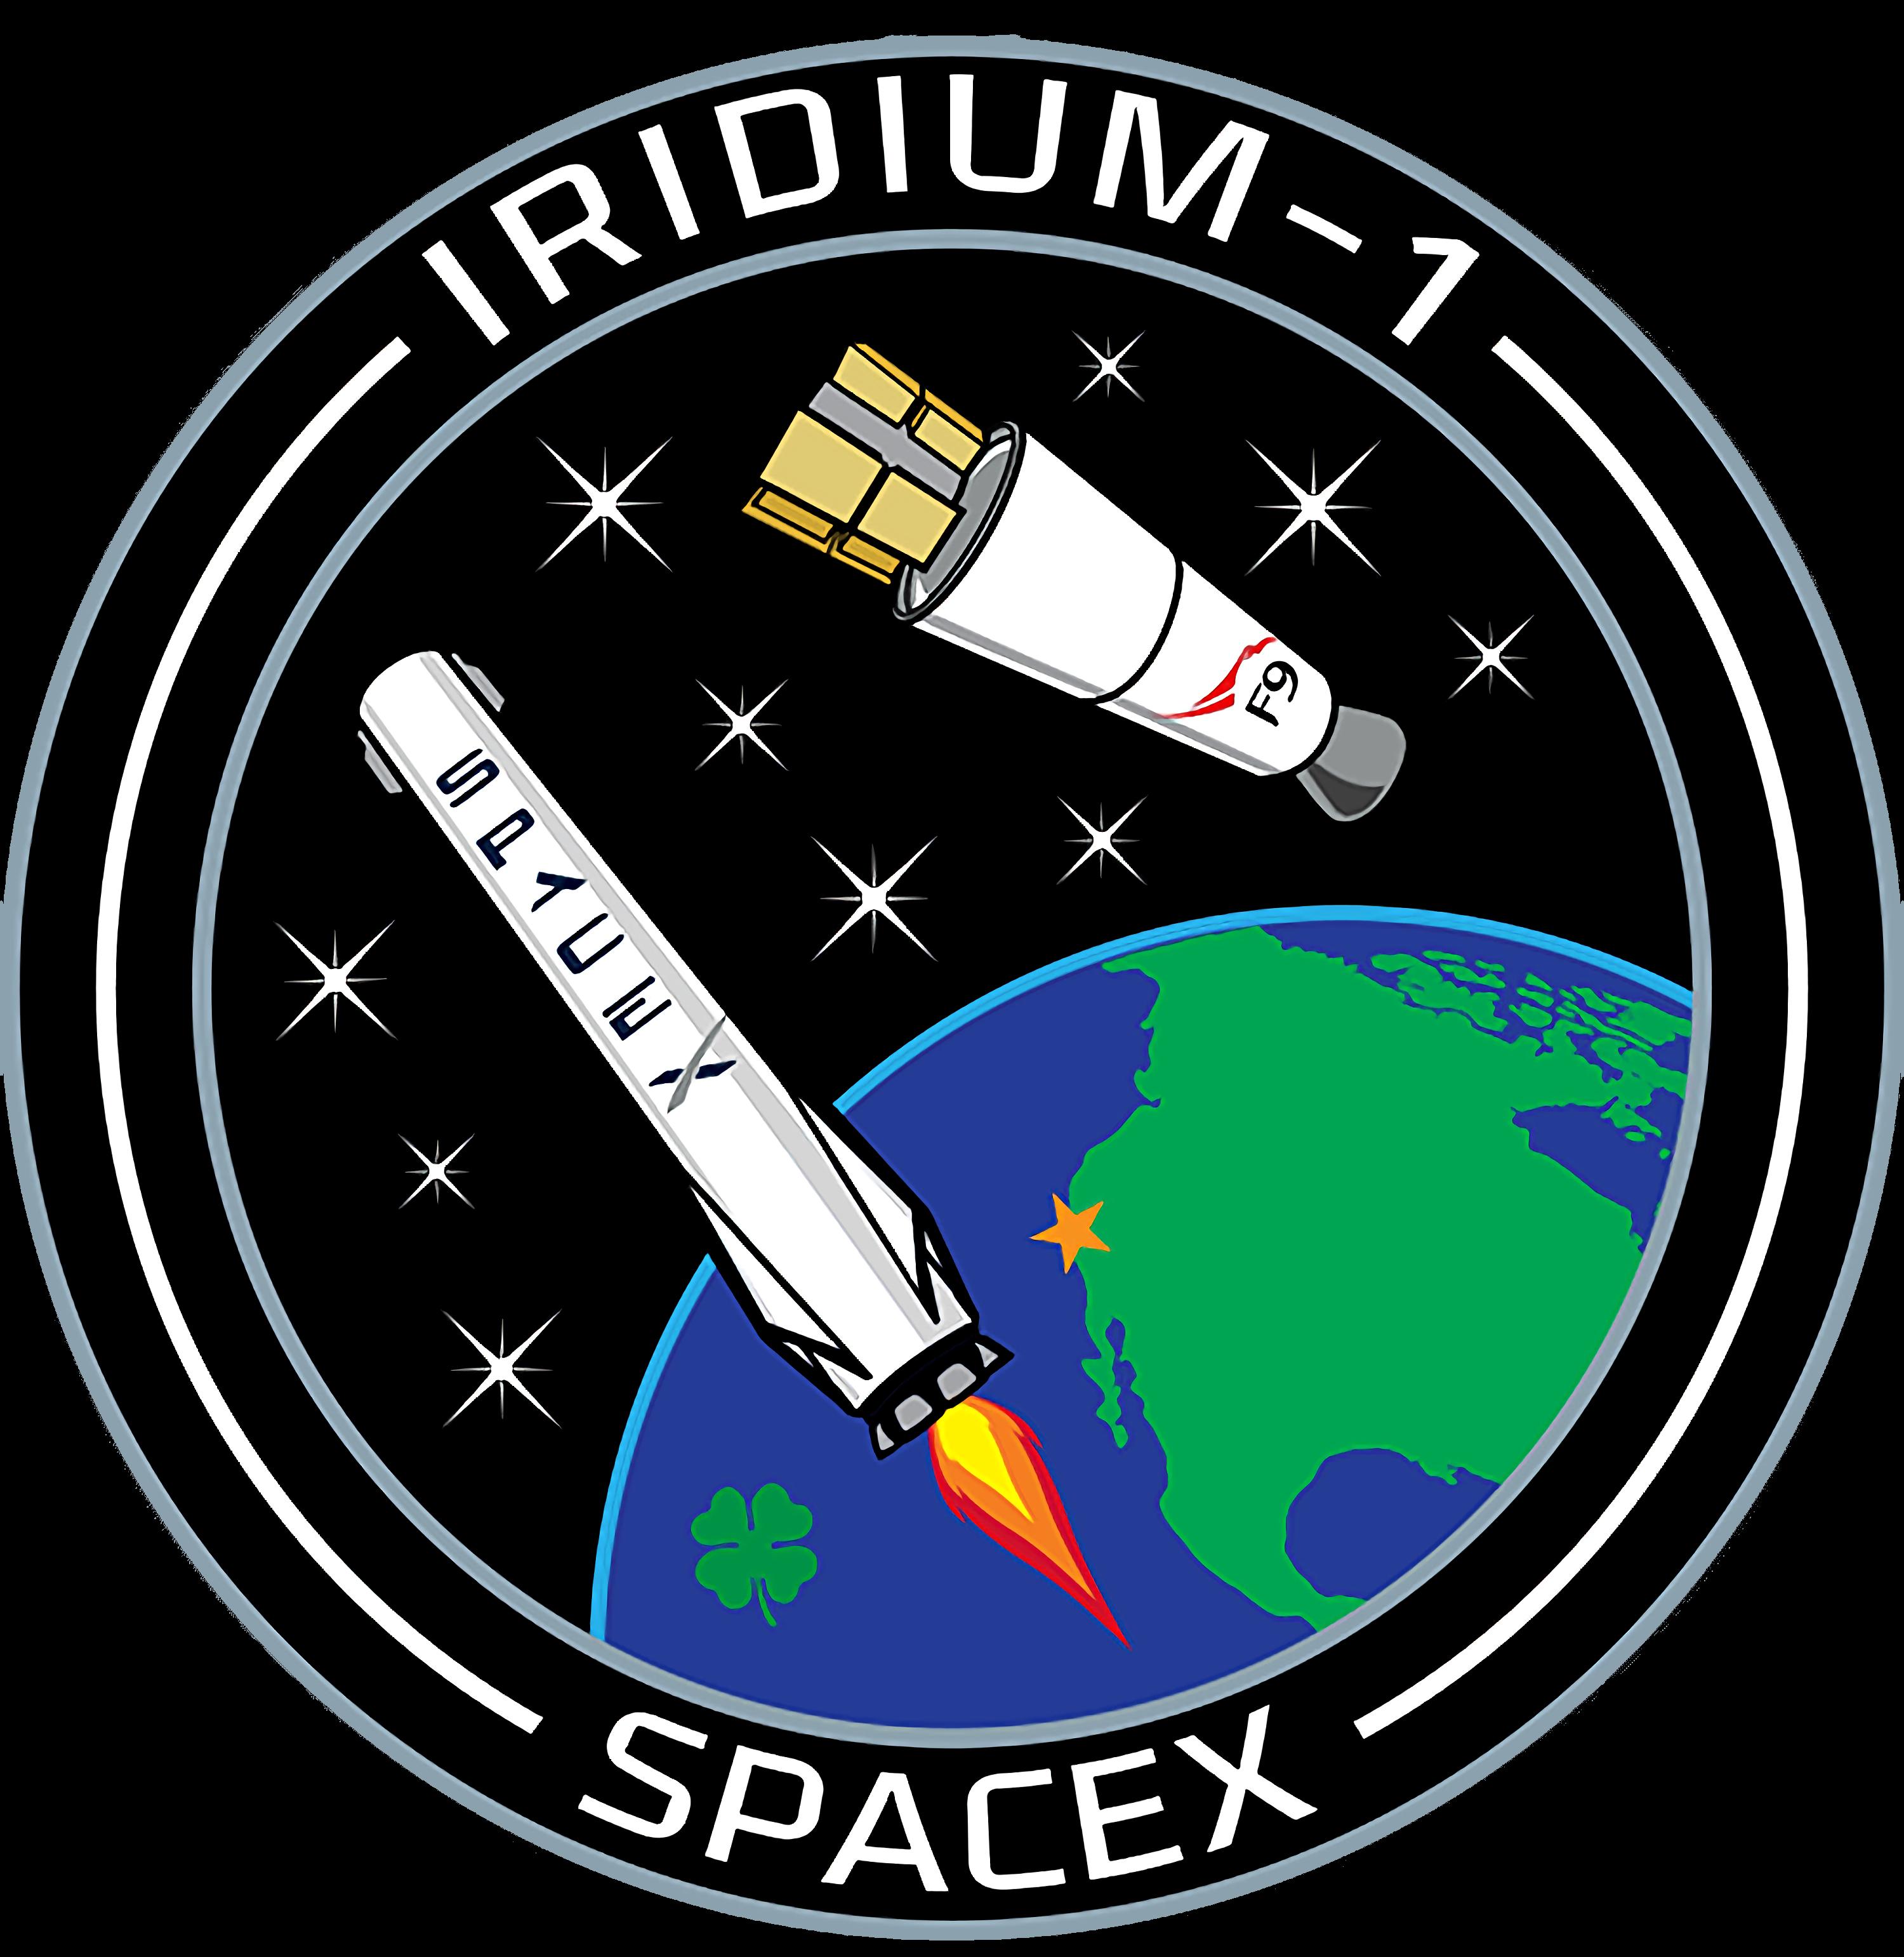 Iridium patch spacex interpolated. Clipart rocket plume